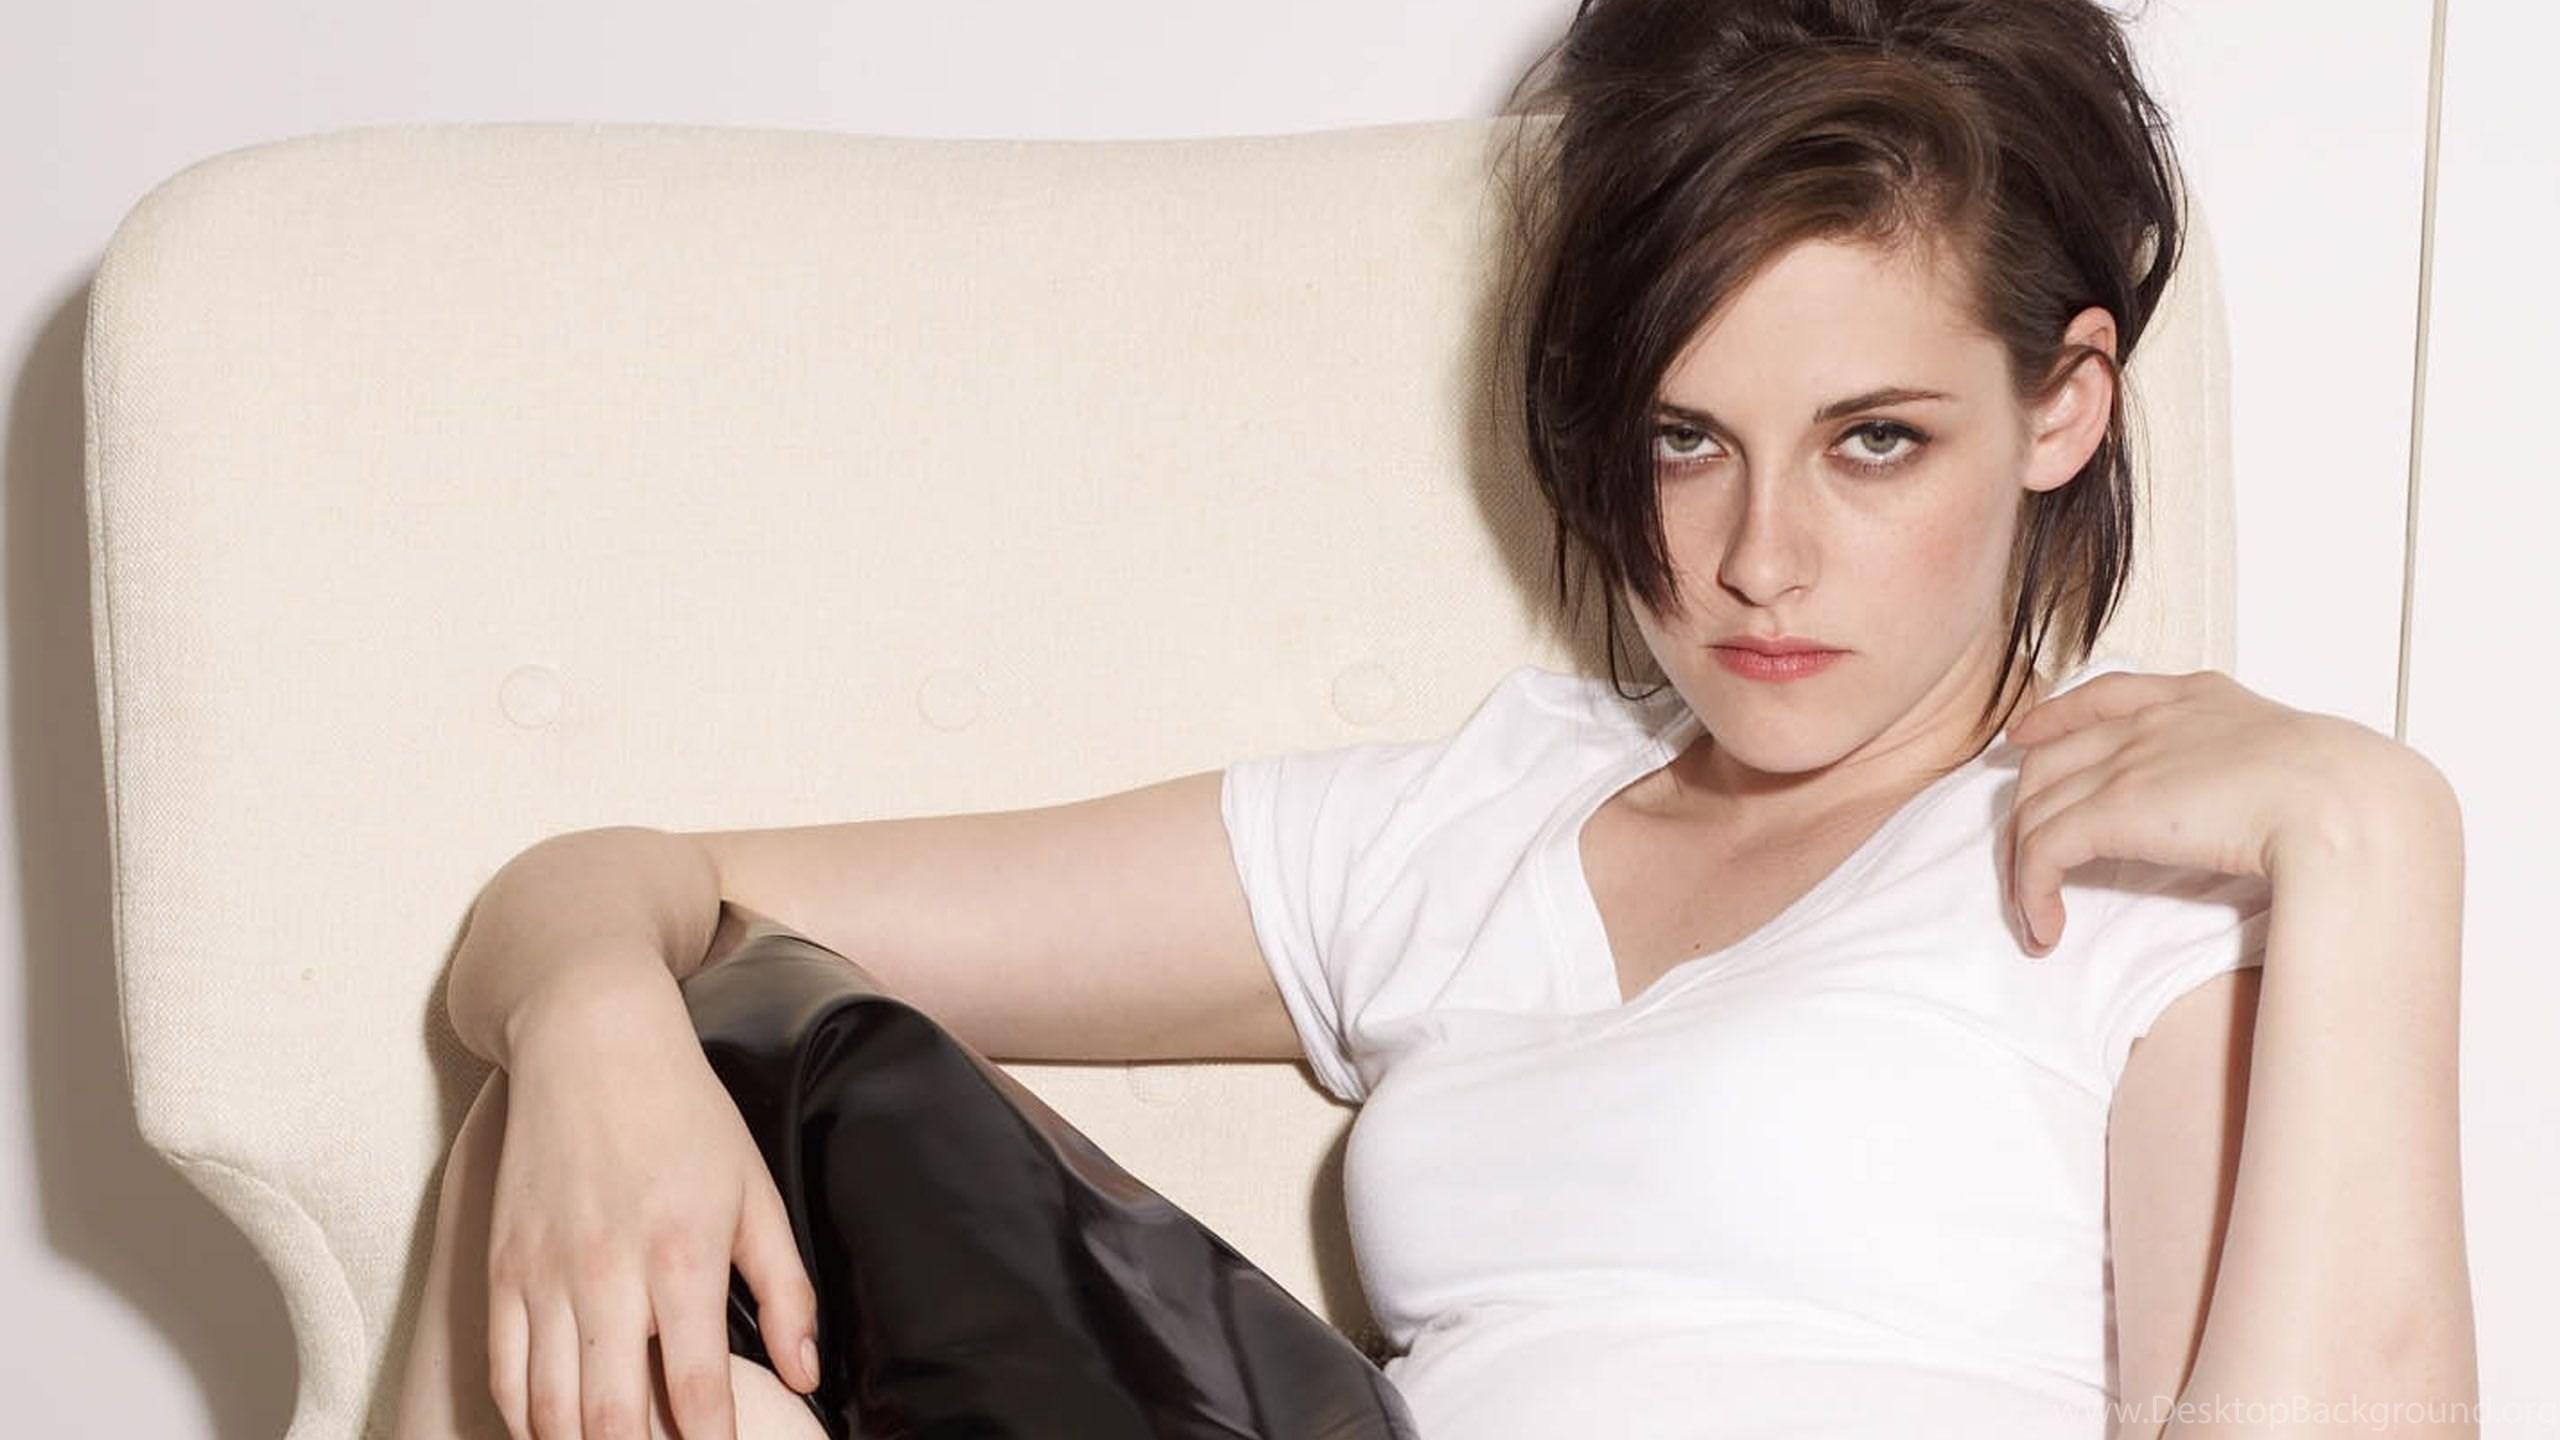 Full Hd Kristen Stewart Wallpapers Desktop Background